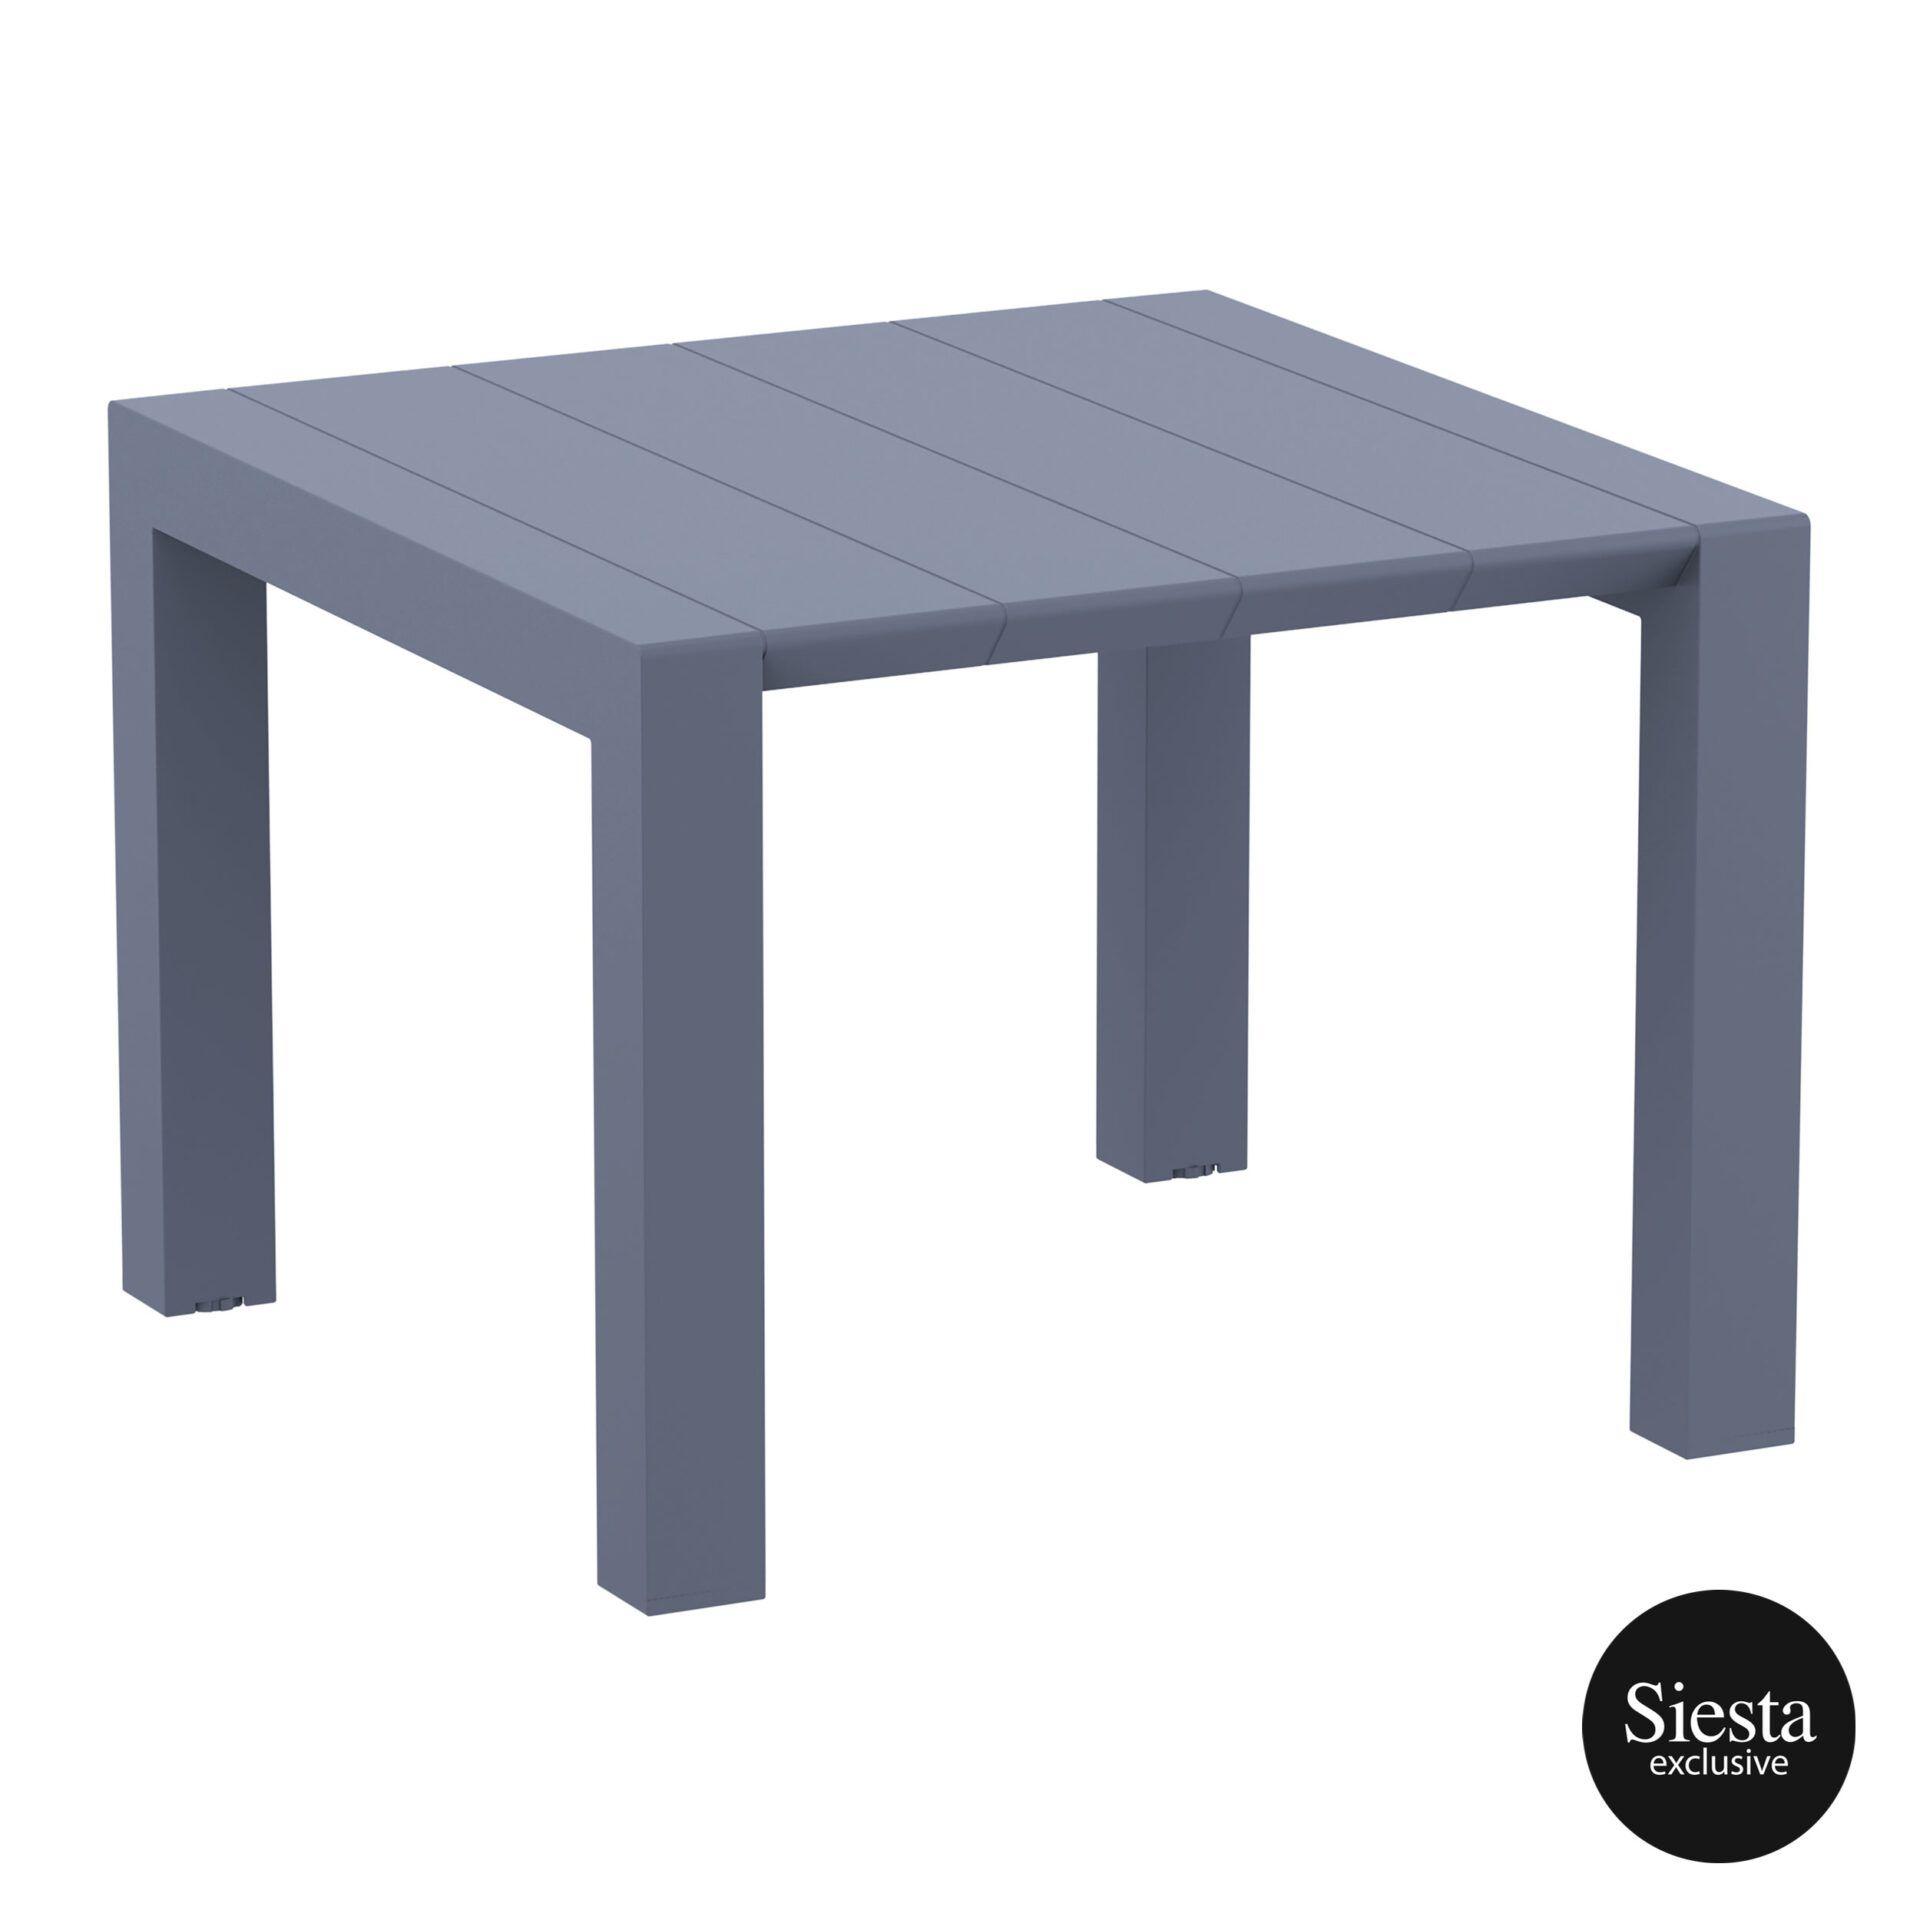 005 vegas table 100 darkgrey front side